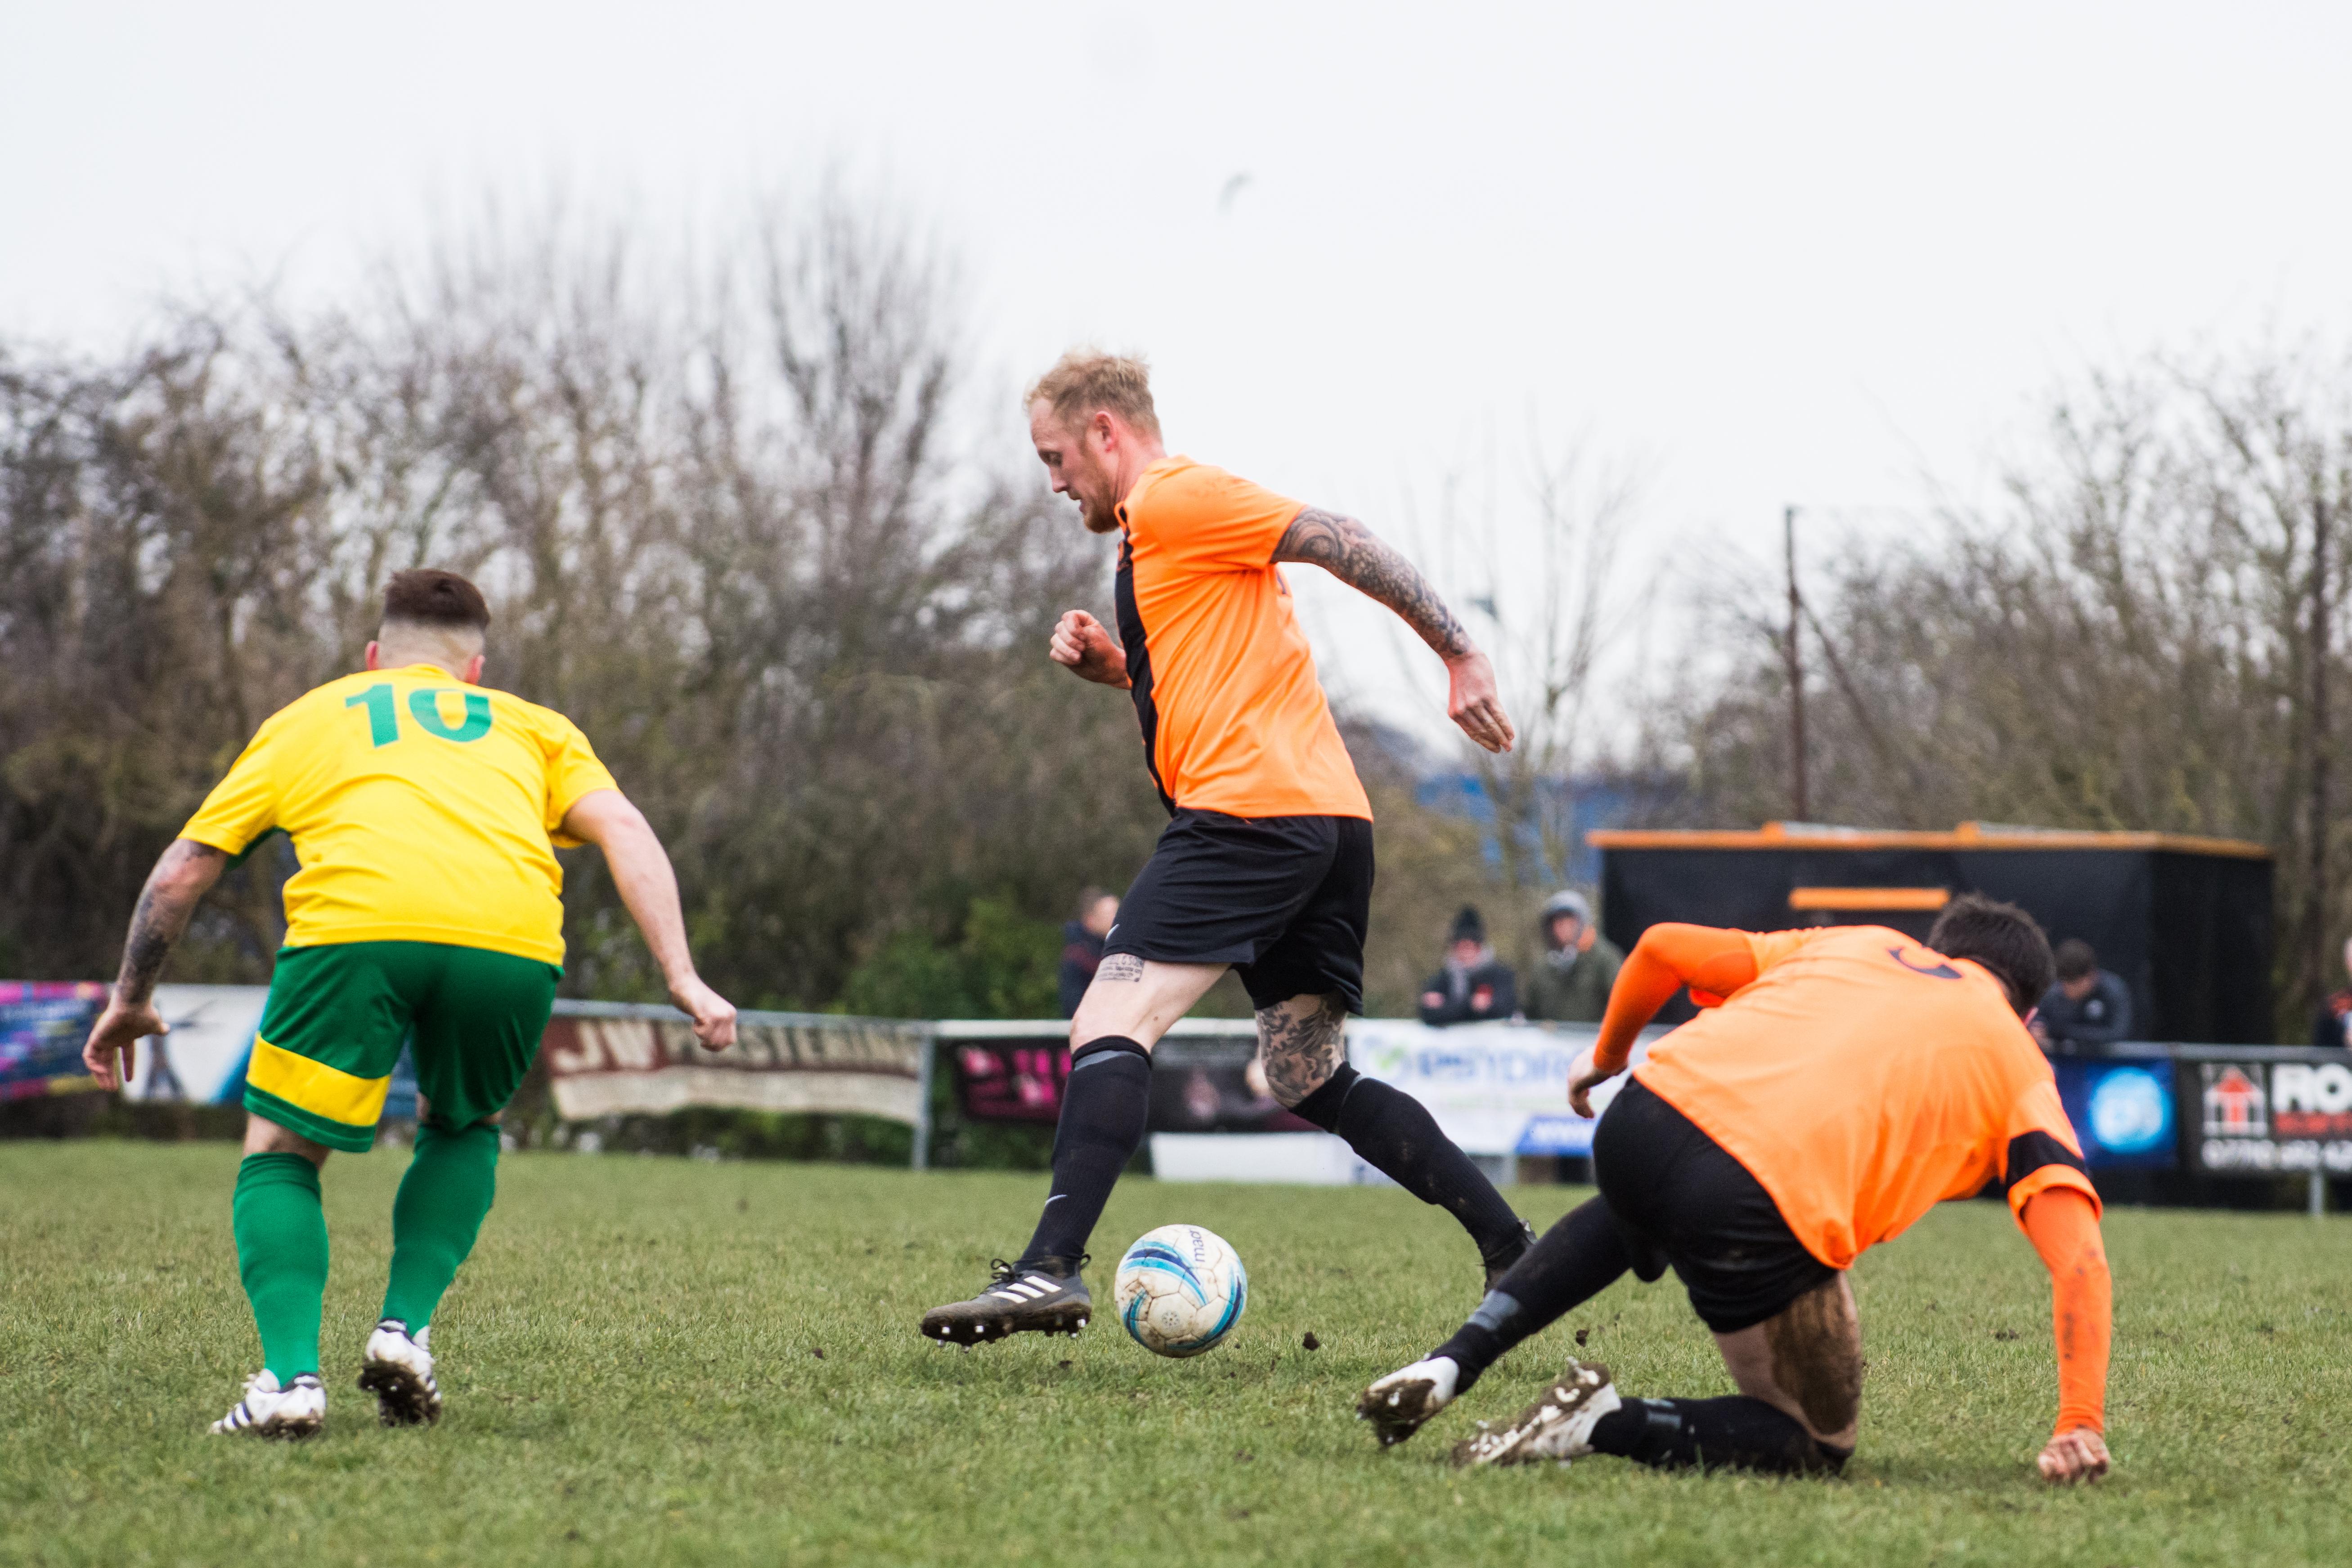 DAVID_JEFFERY Mile Oak FC vs Hailsham Town FC 24.03.18 47